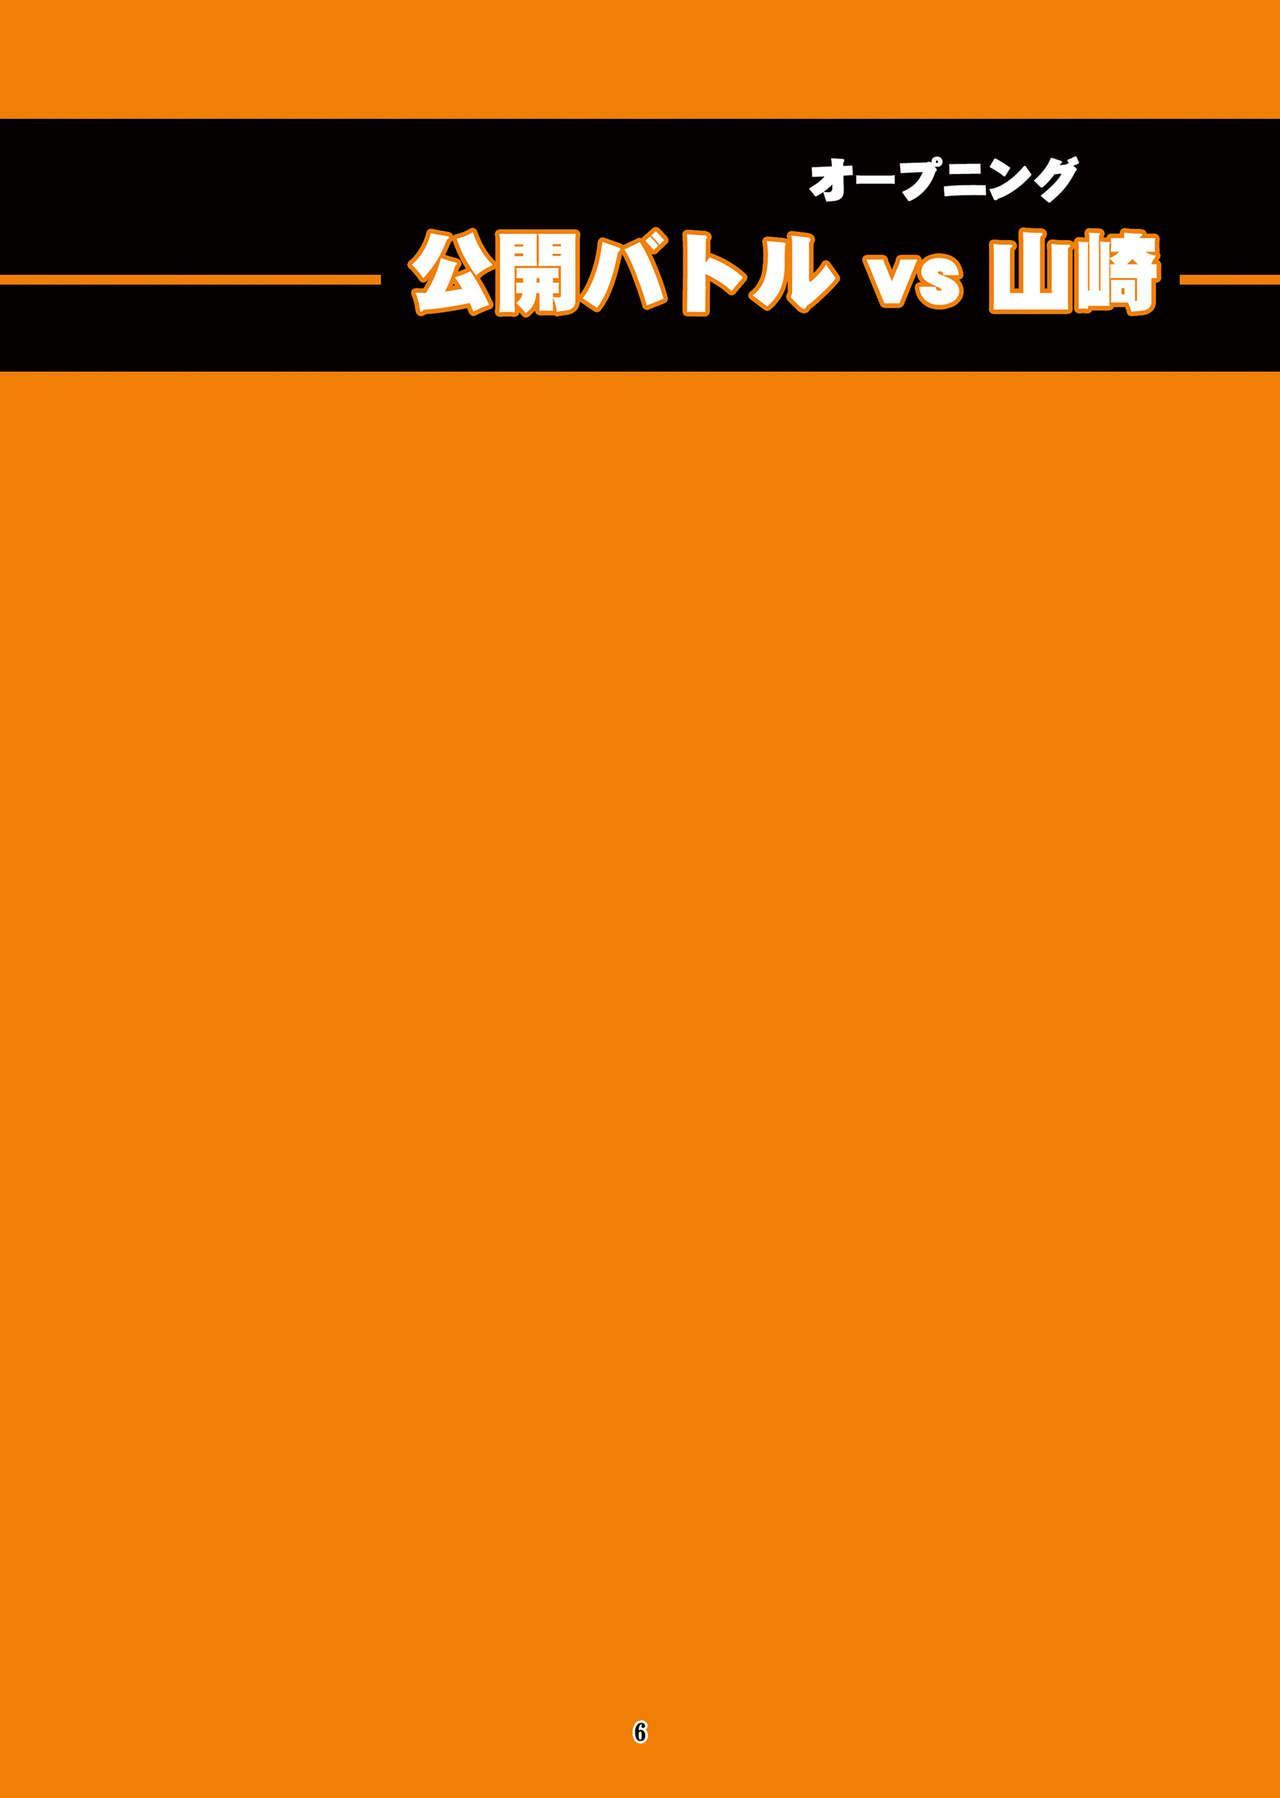 [LINDA]「舞ing(まいっちんぐ)完全版」サンプル●不知火舞 3